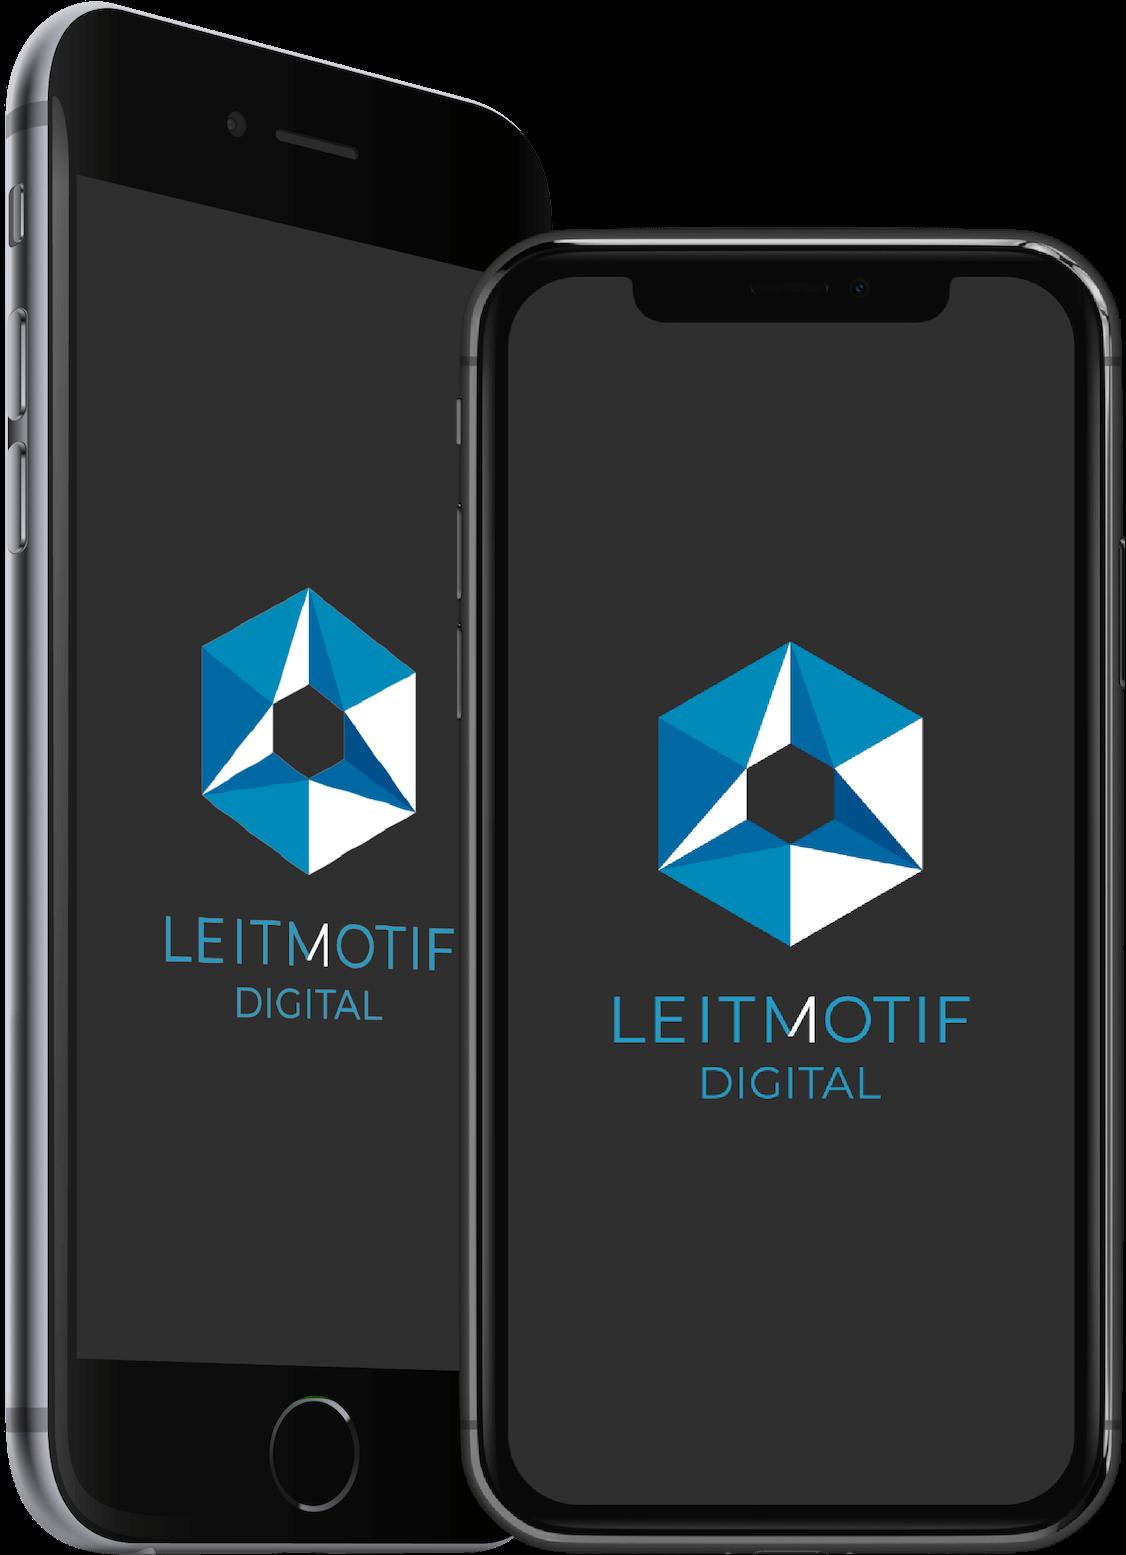 LEITMOTIF Mobiles